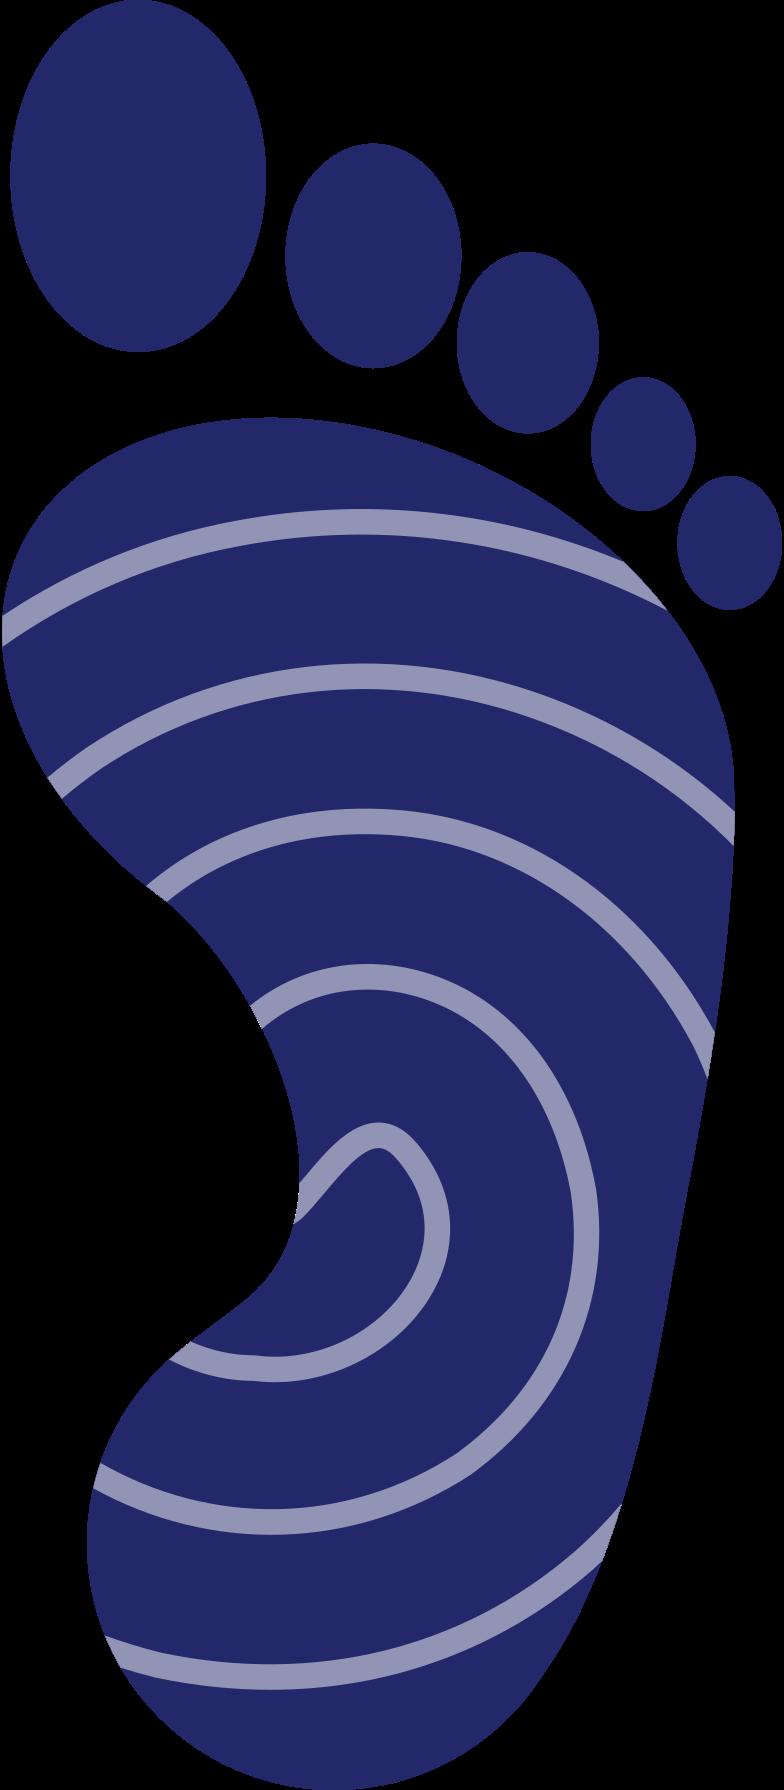 footprint Clipart illustration in PNG, SVG